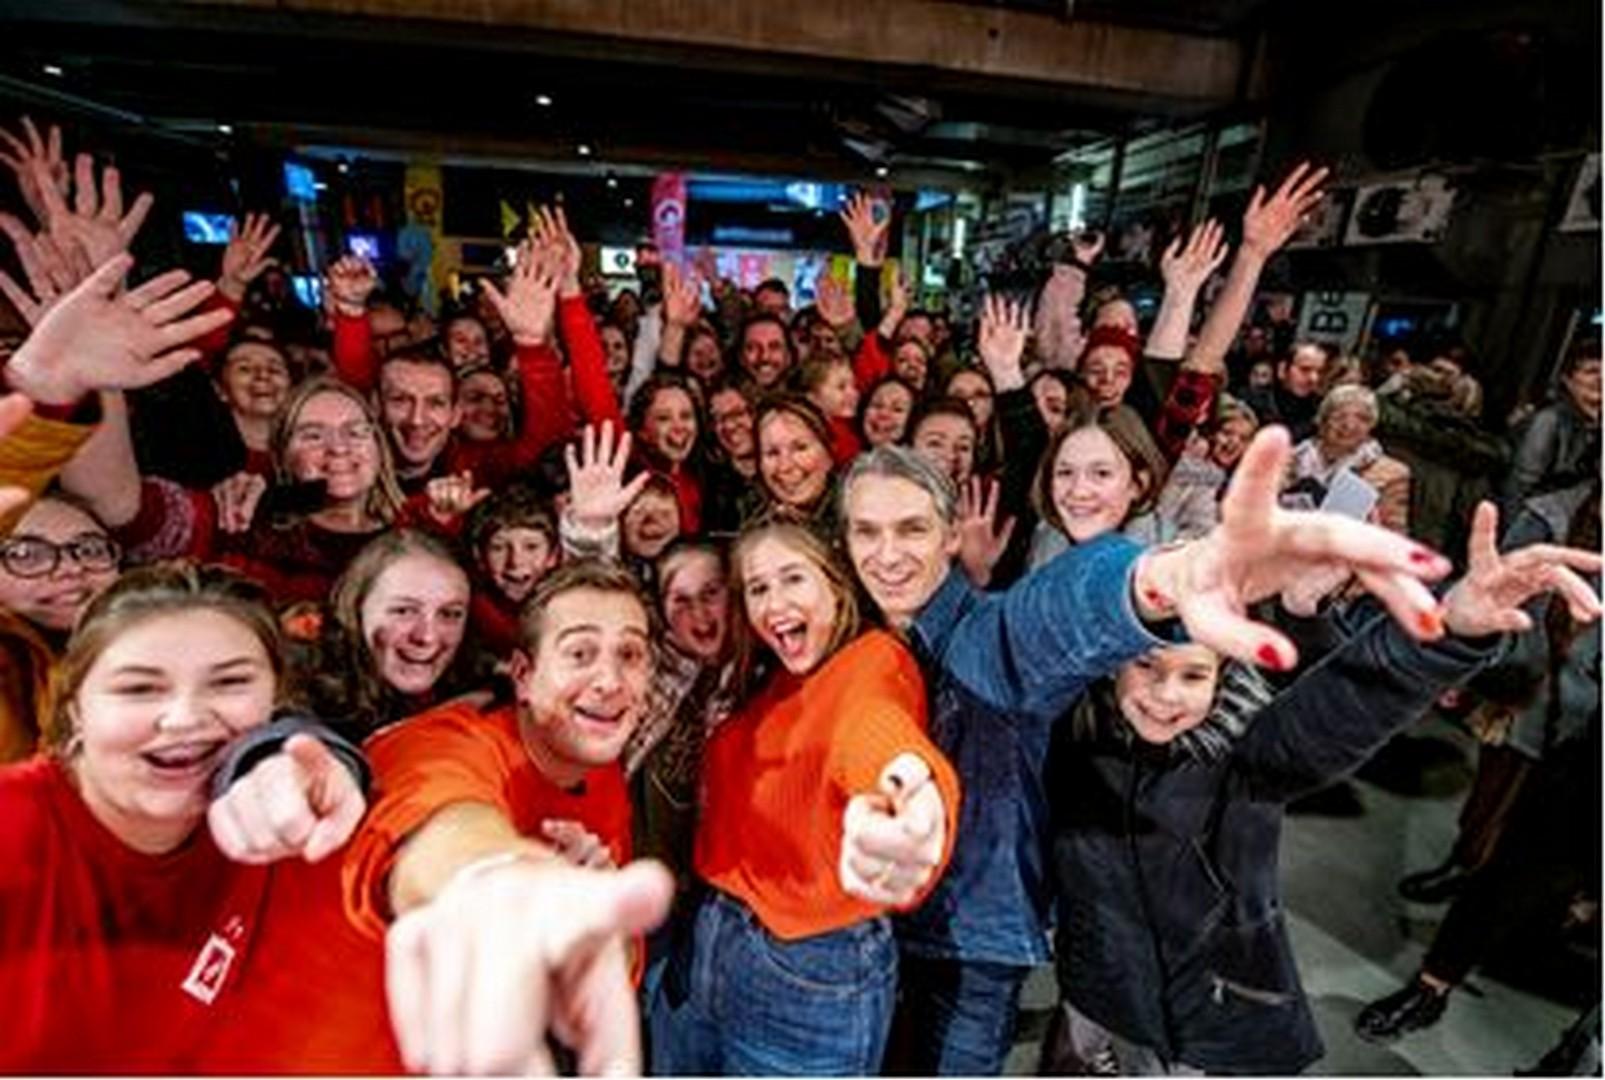 Rode Neuzen Dag 2019 maakt 423.335 jongeren sterker - Rode Neuzen Dag 2019 5